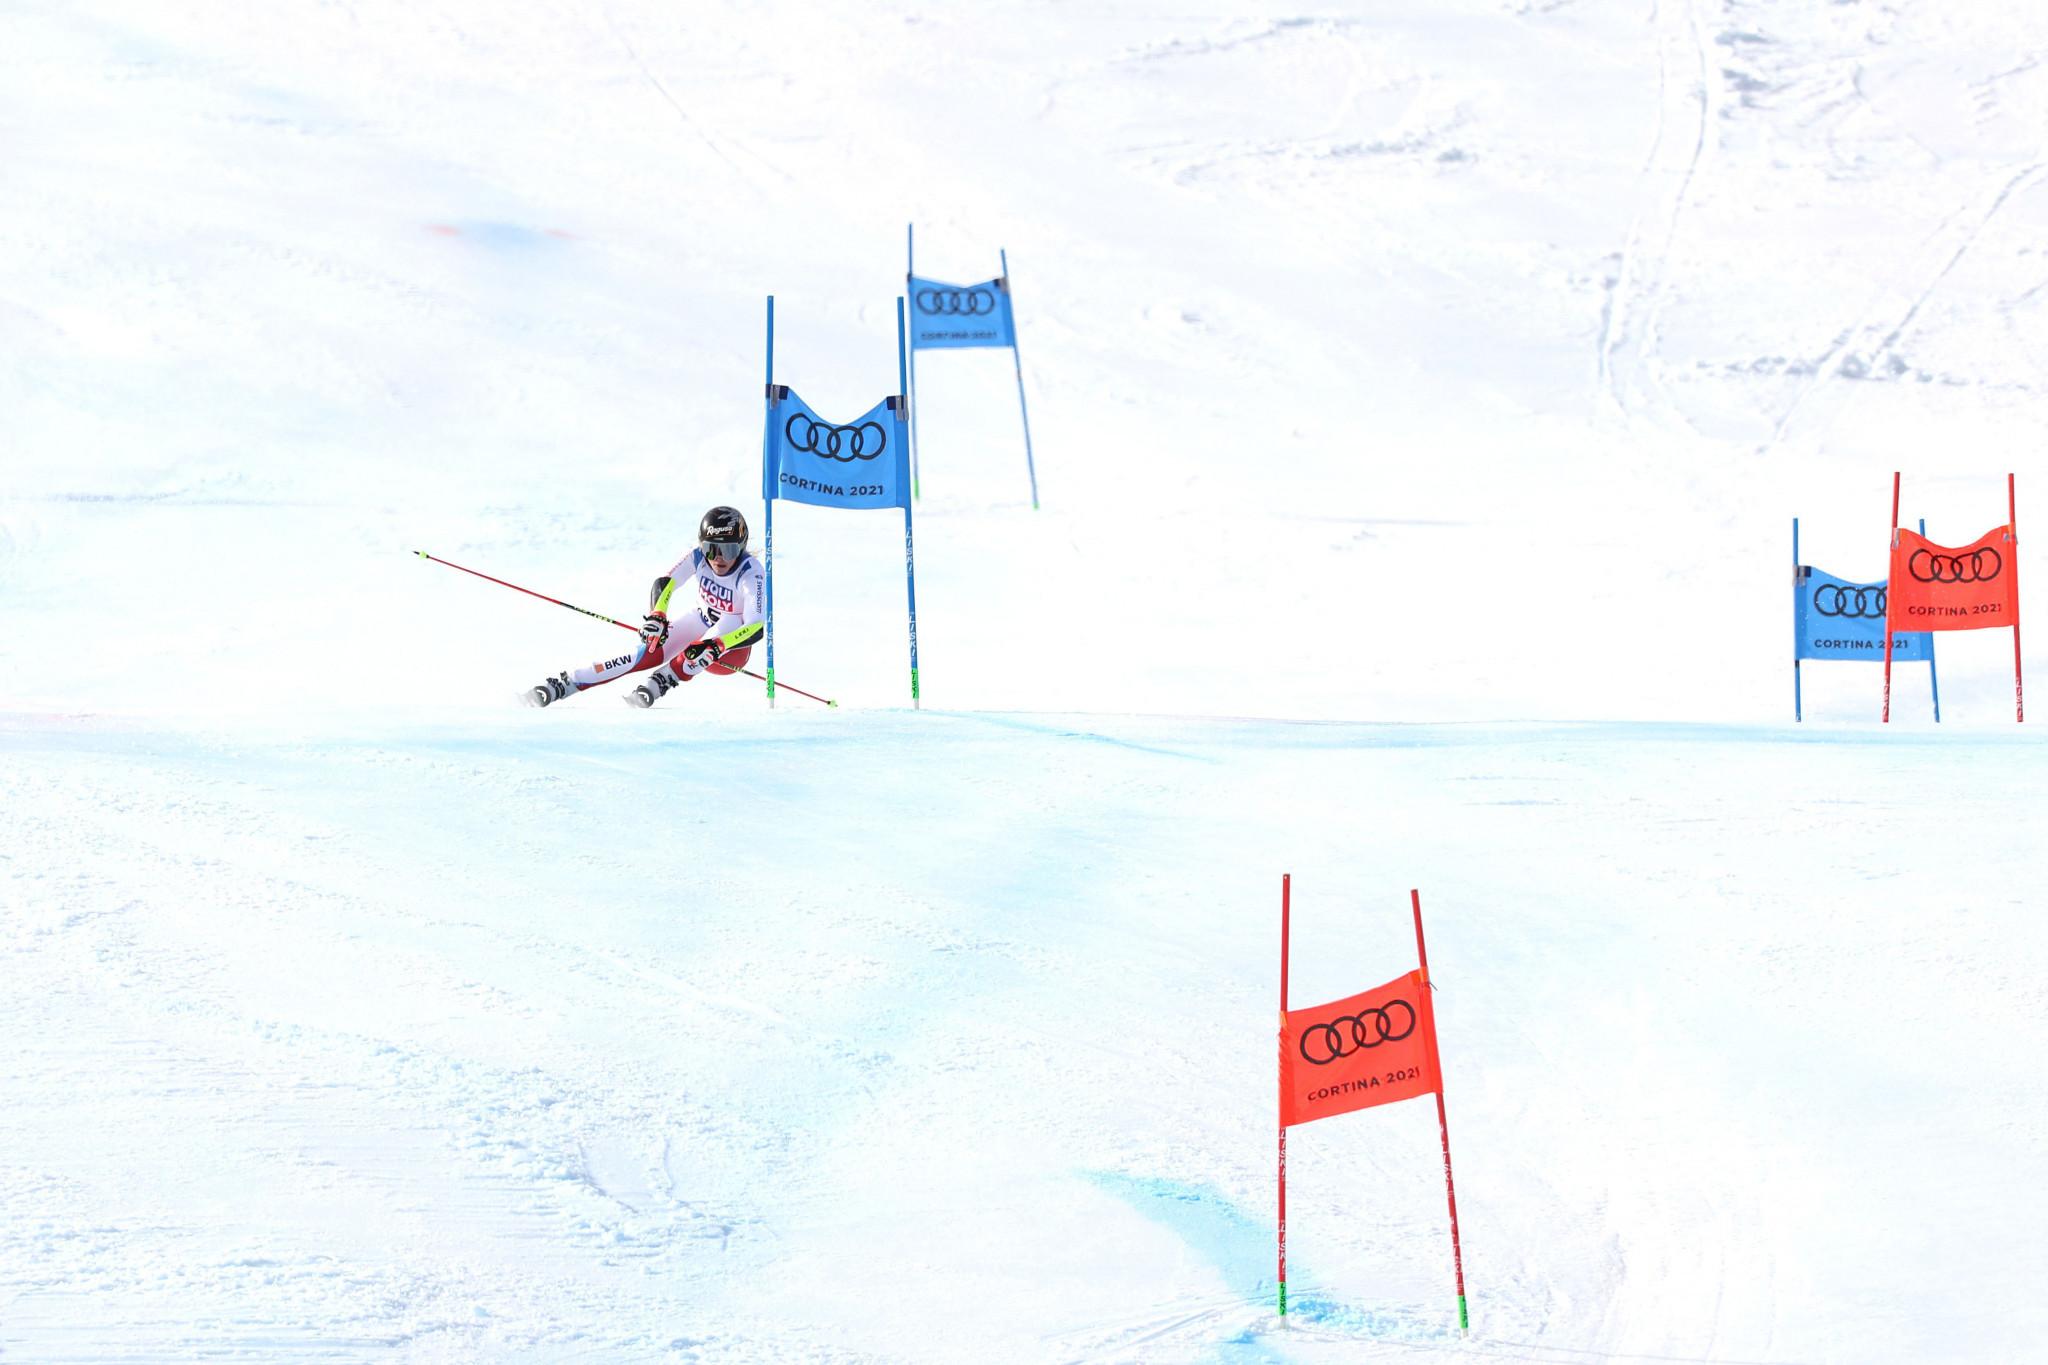 Gut-Behrami edges Shiffrin to win giant slalom at FIS Alpine World Ski Championships